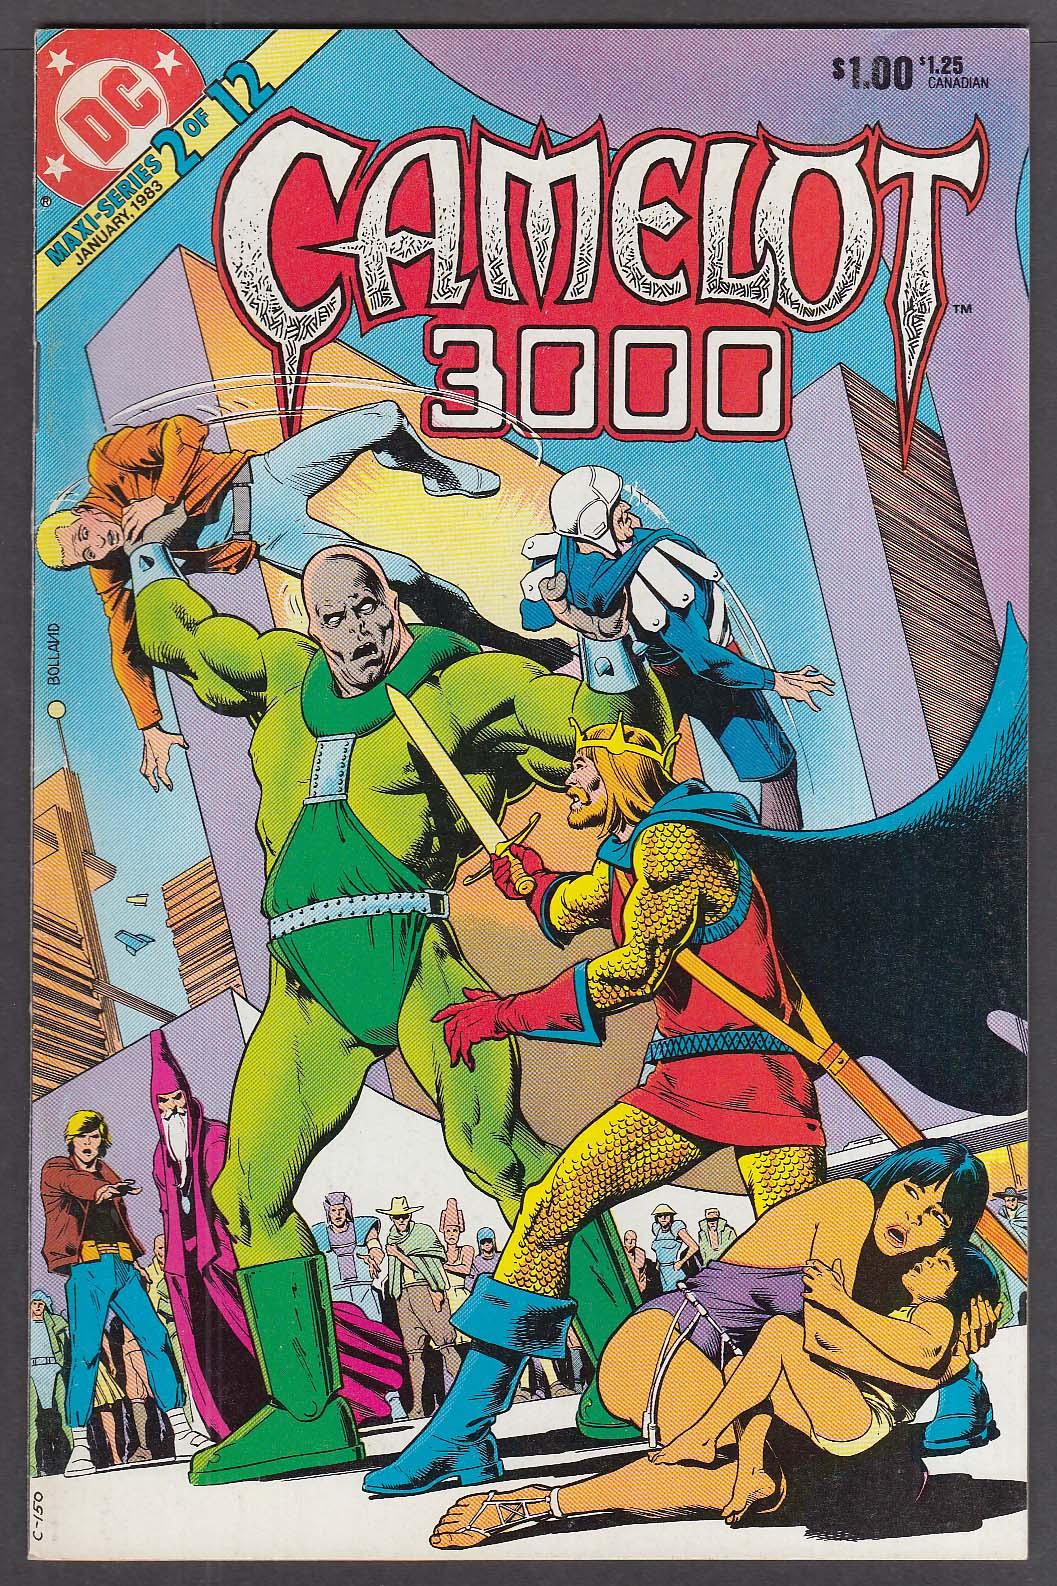 CAMELOT 3000 #2 DC comic book 1/1983